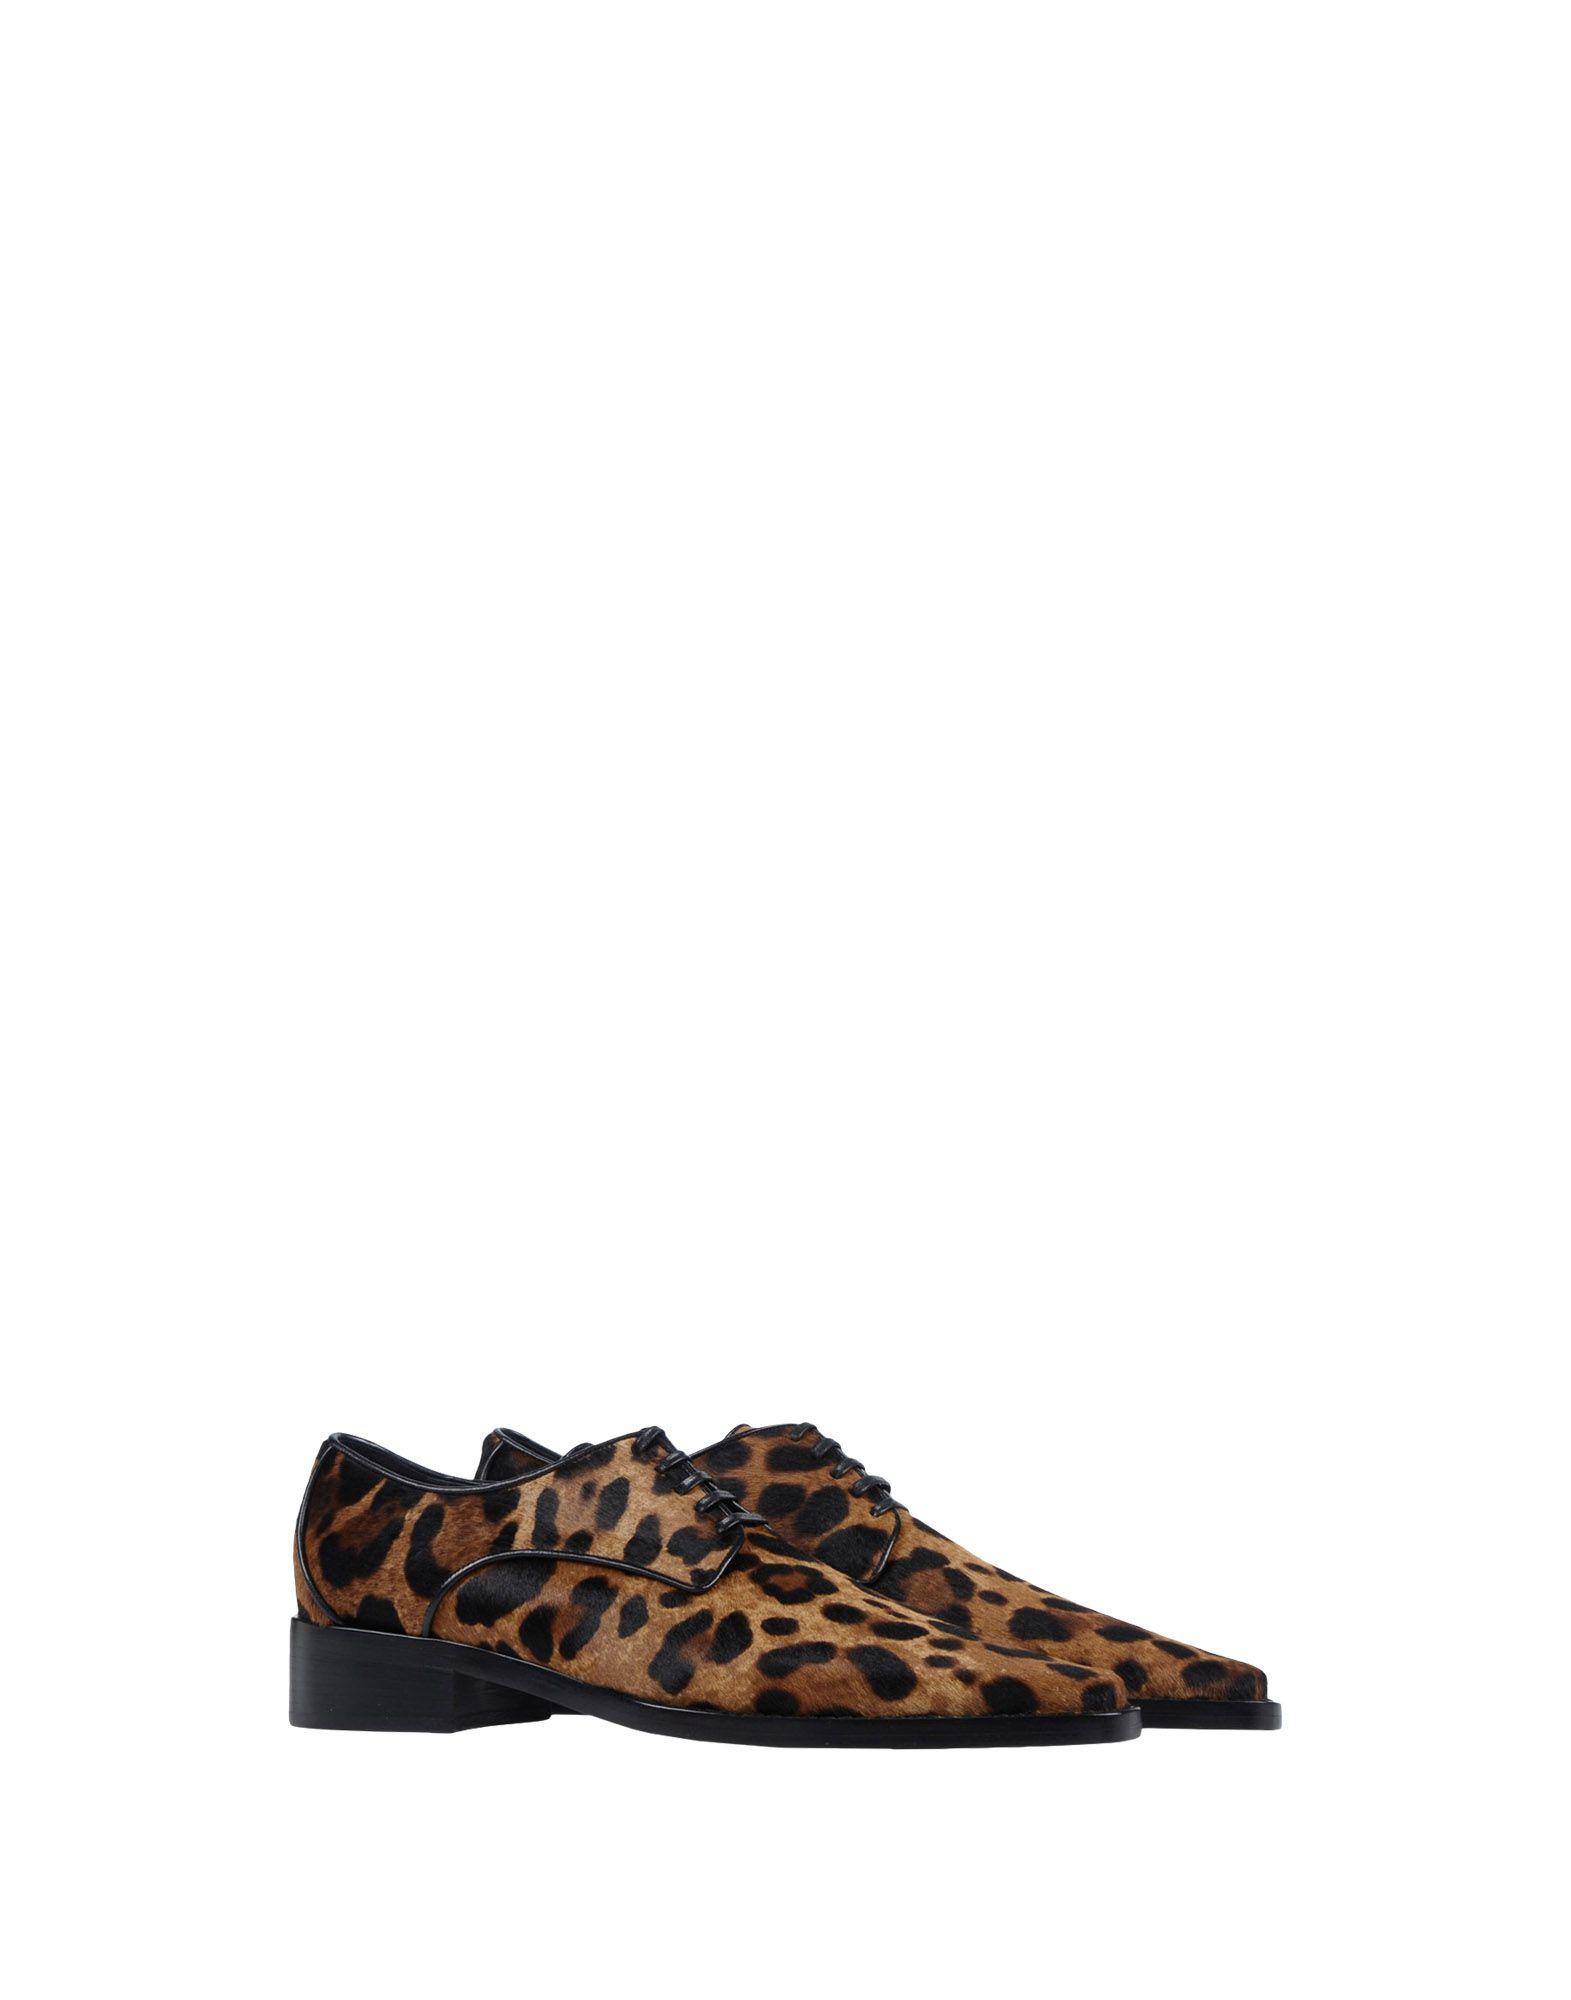 Dolce & Gabbana Schnürschuhe Damen Schuhe  11496383WFGünstige gut aussehende Schuhe Damen 852fec